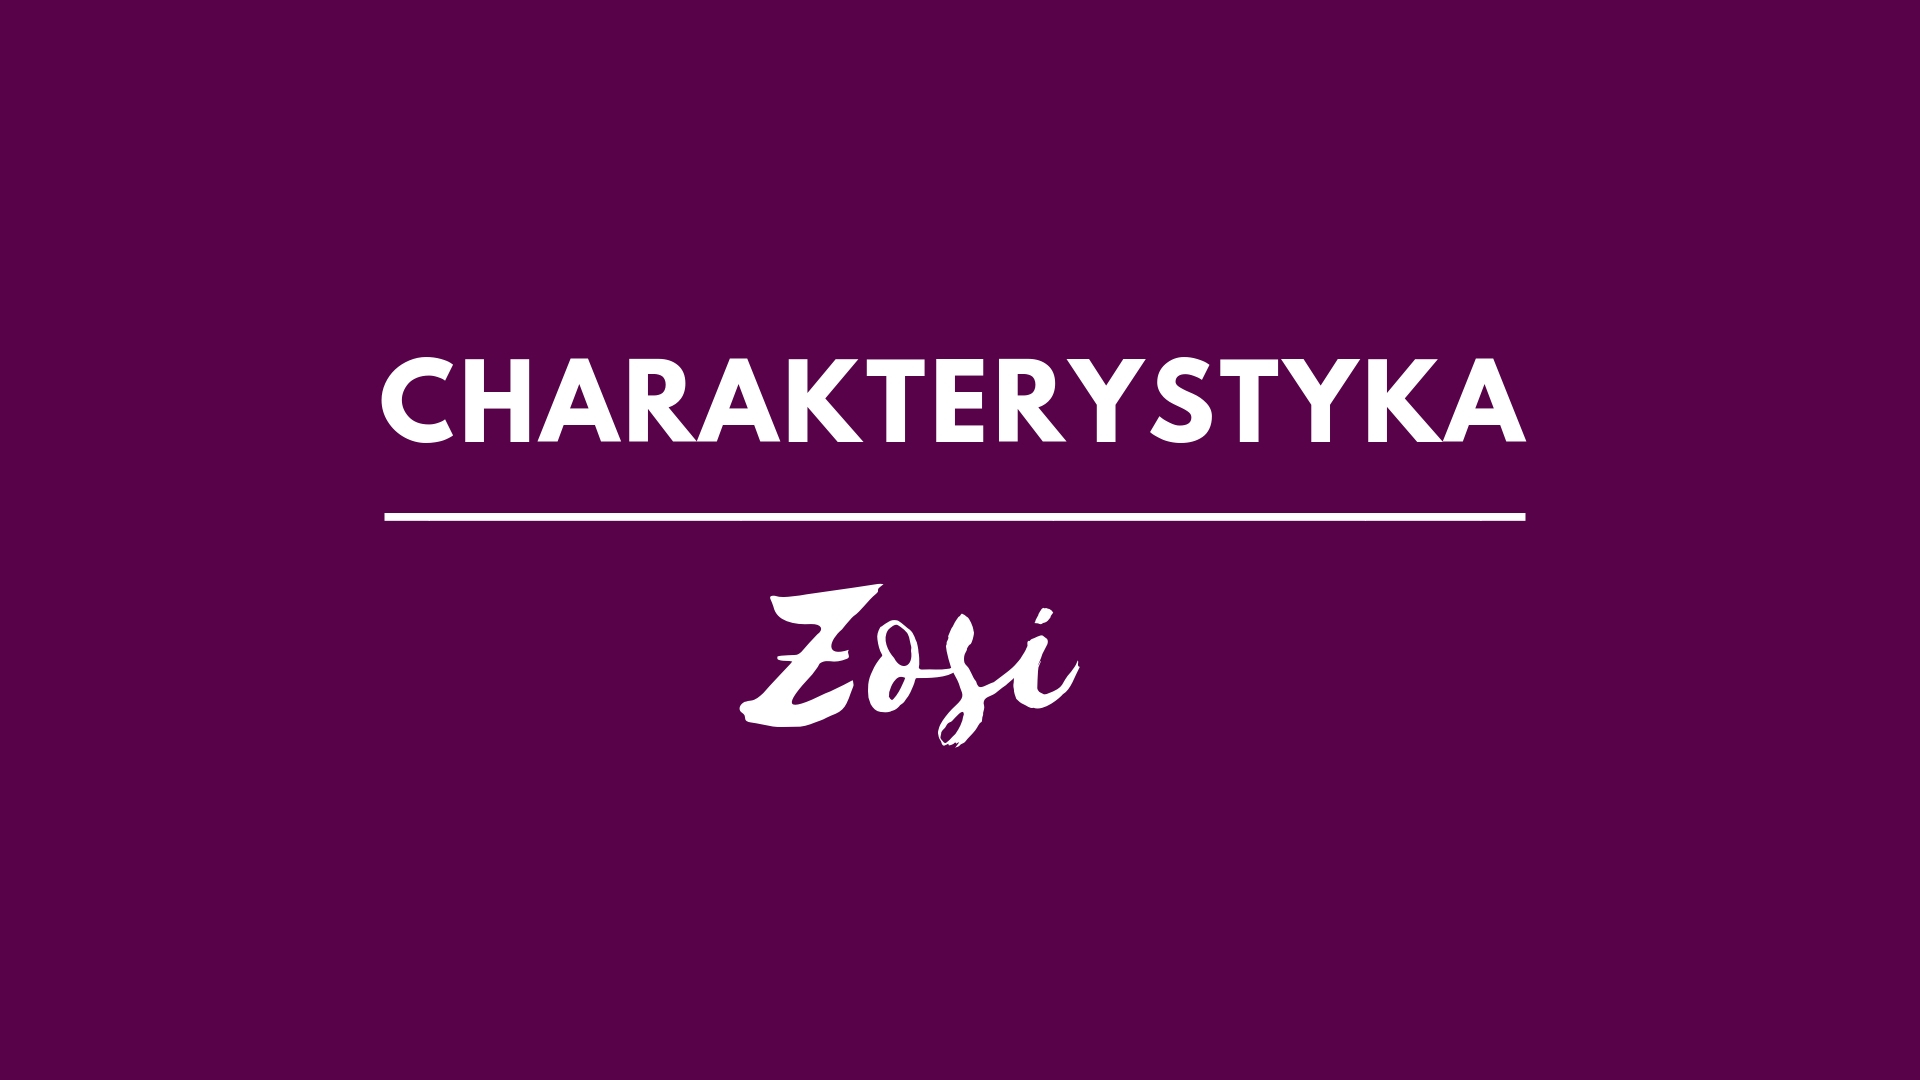 Charakterystyka Zosi